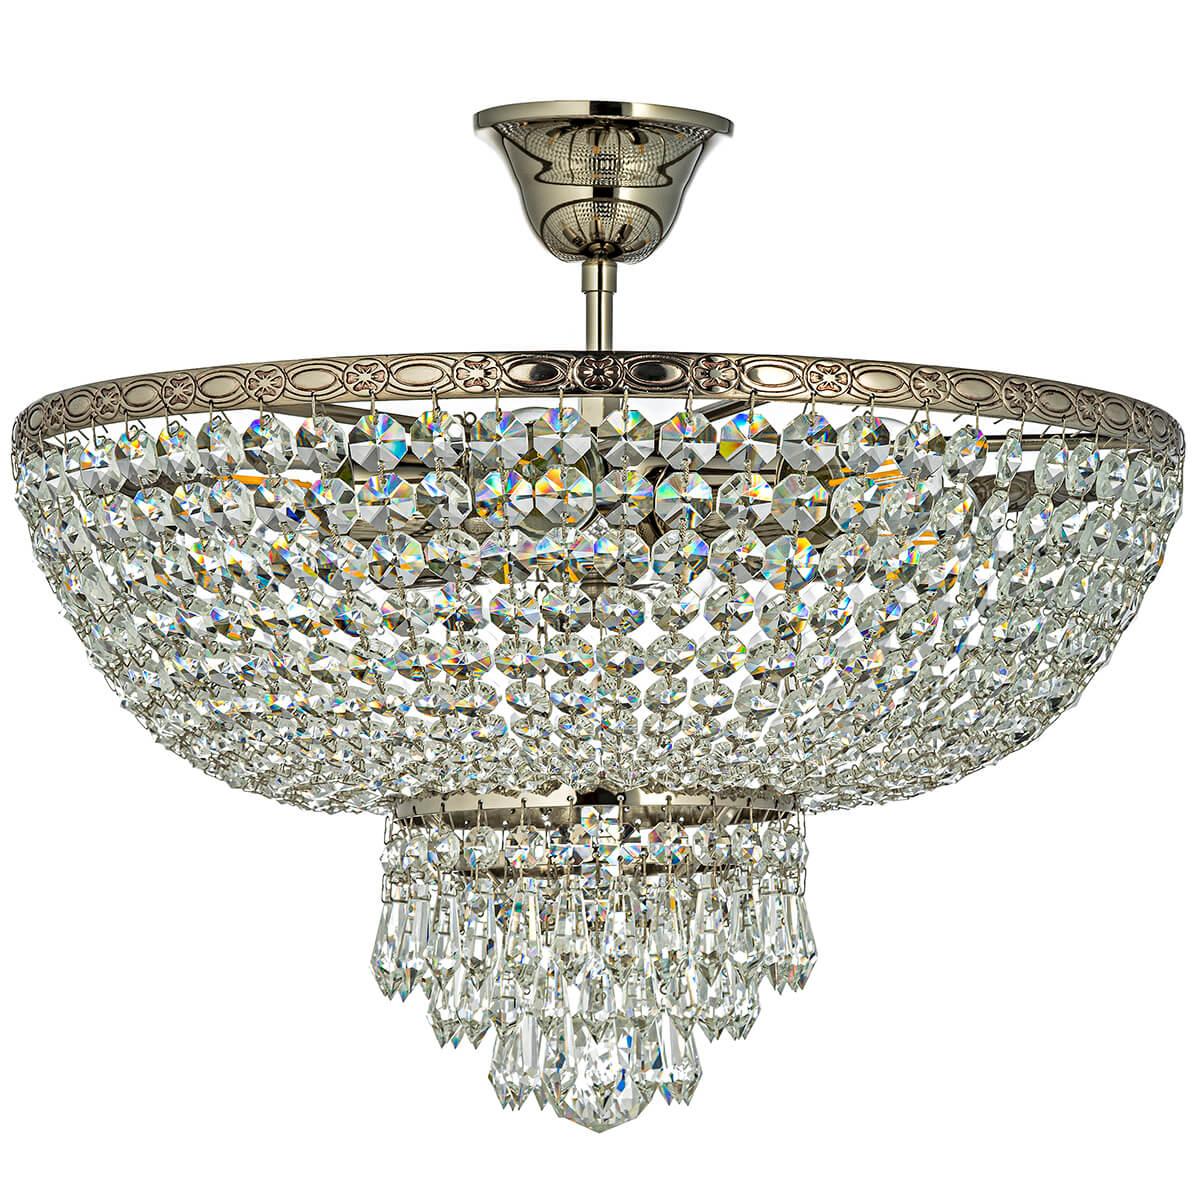 Потолочный светильник Arti Lampadari Nonna E 1.3.40.502 N цена и фото